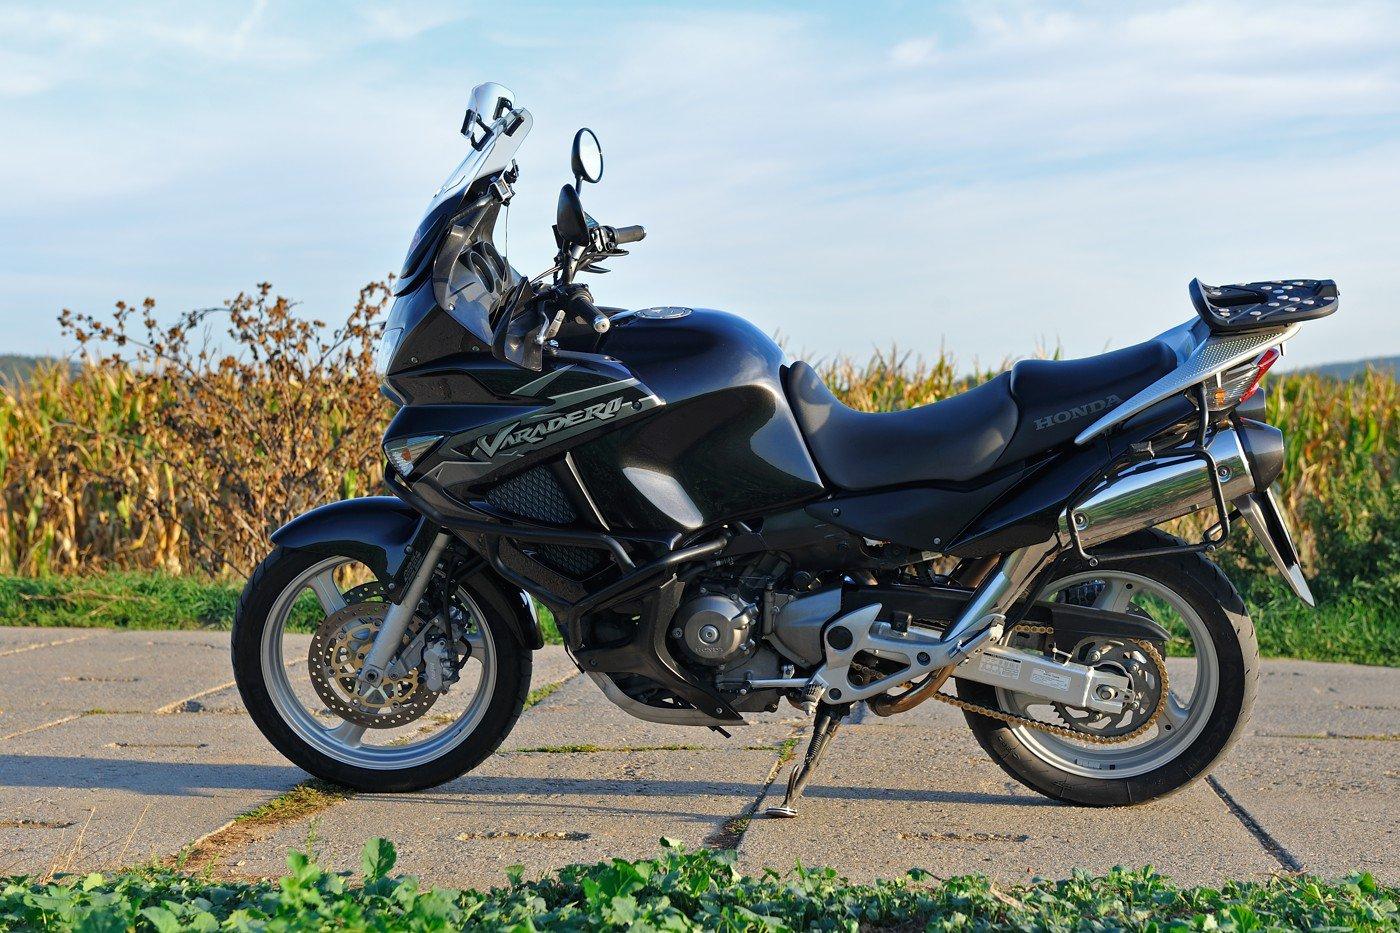 Honda XL 1000 V Varadero